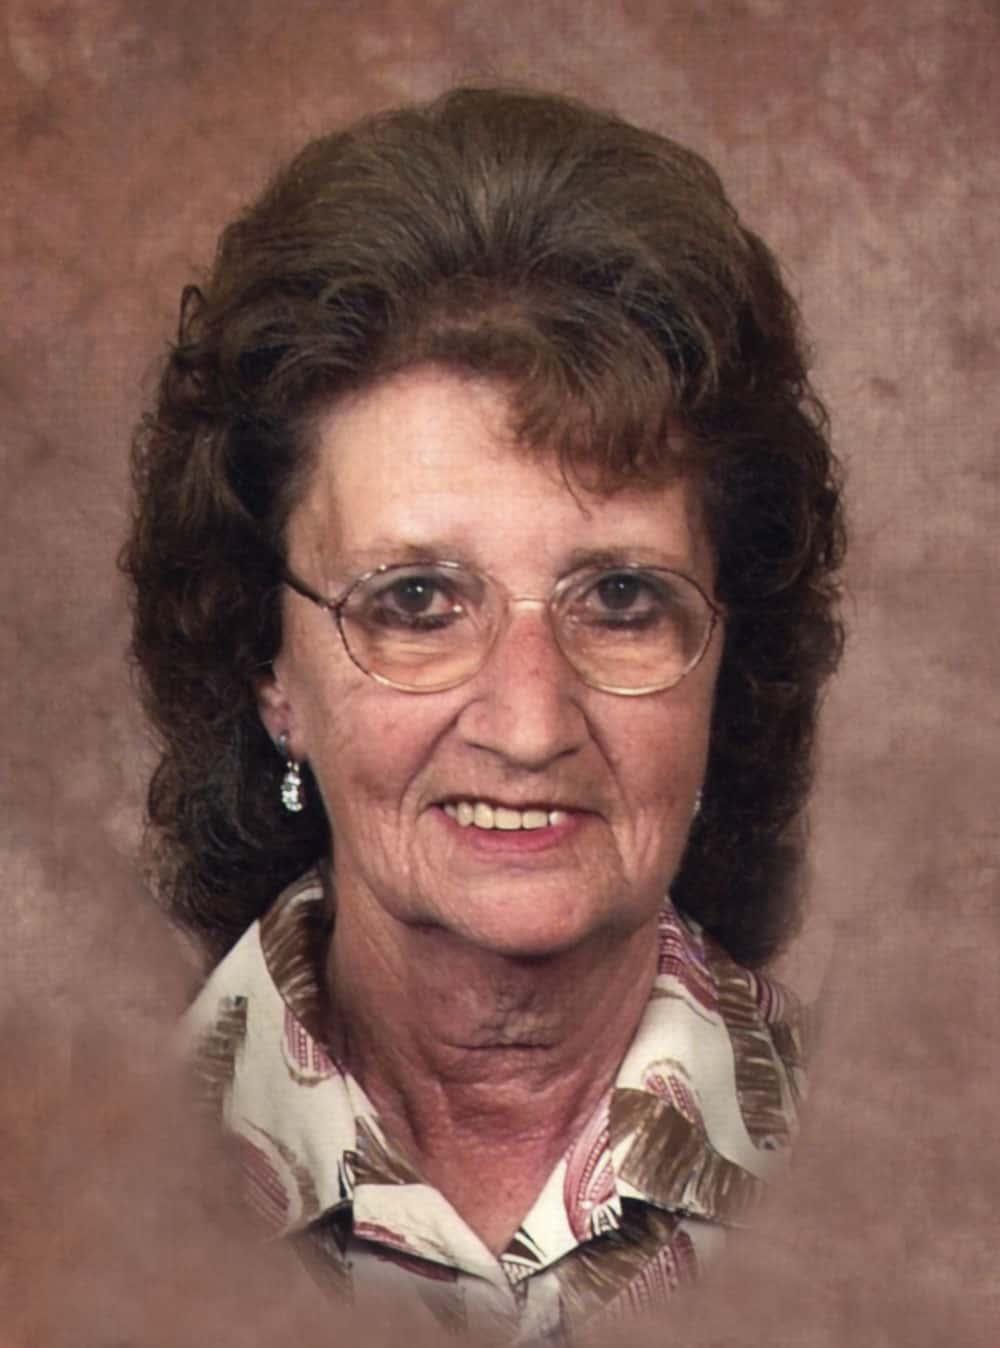 Bertha-Davis-obit-photo-STDRES